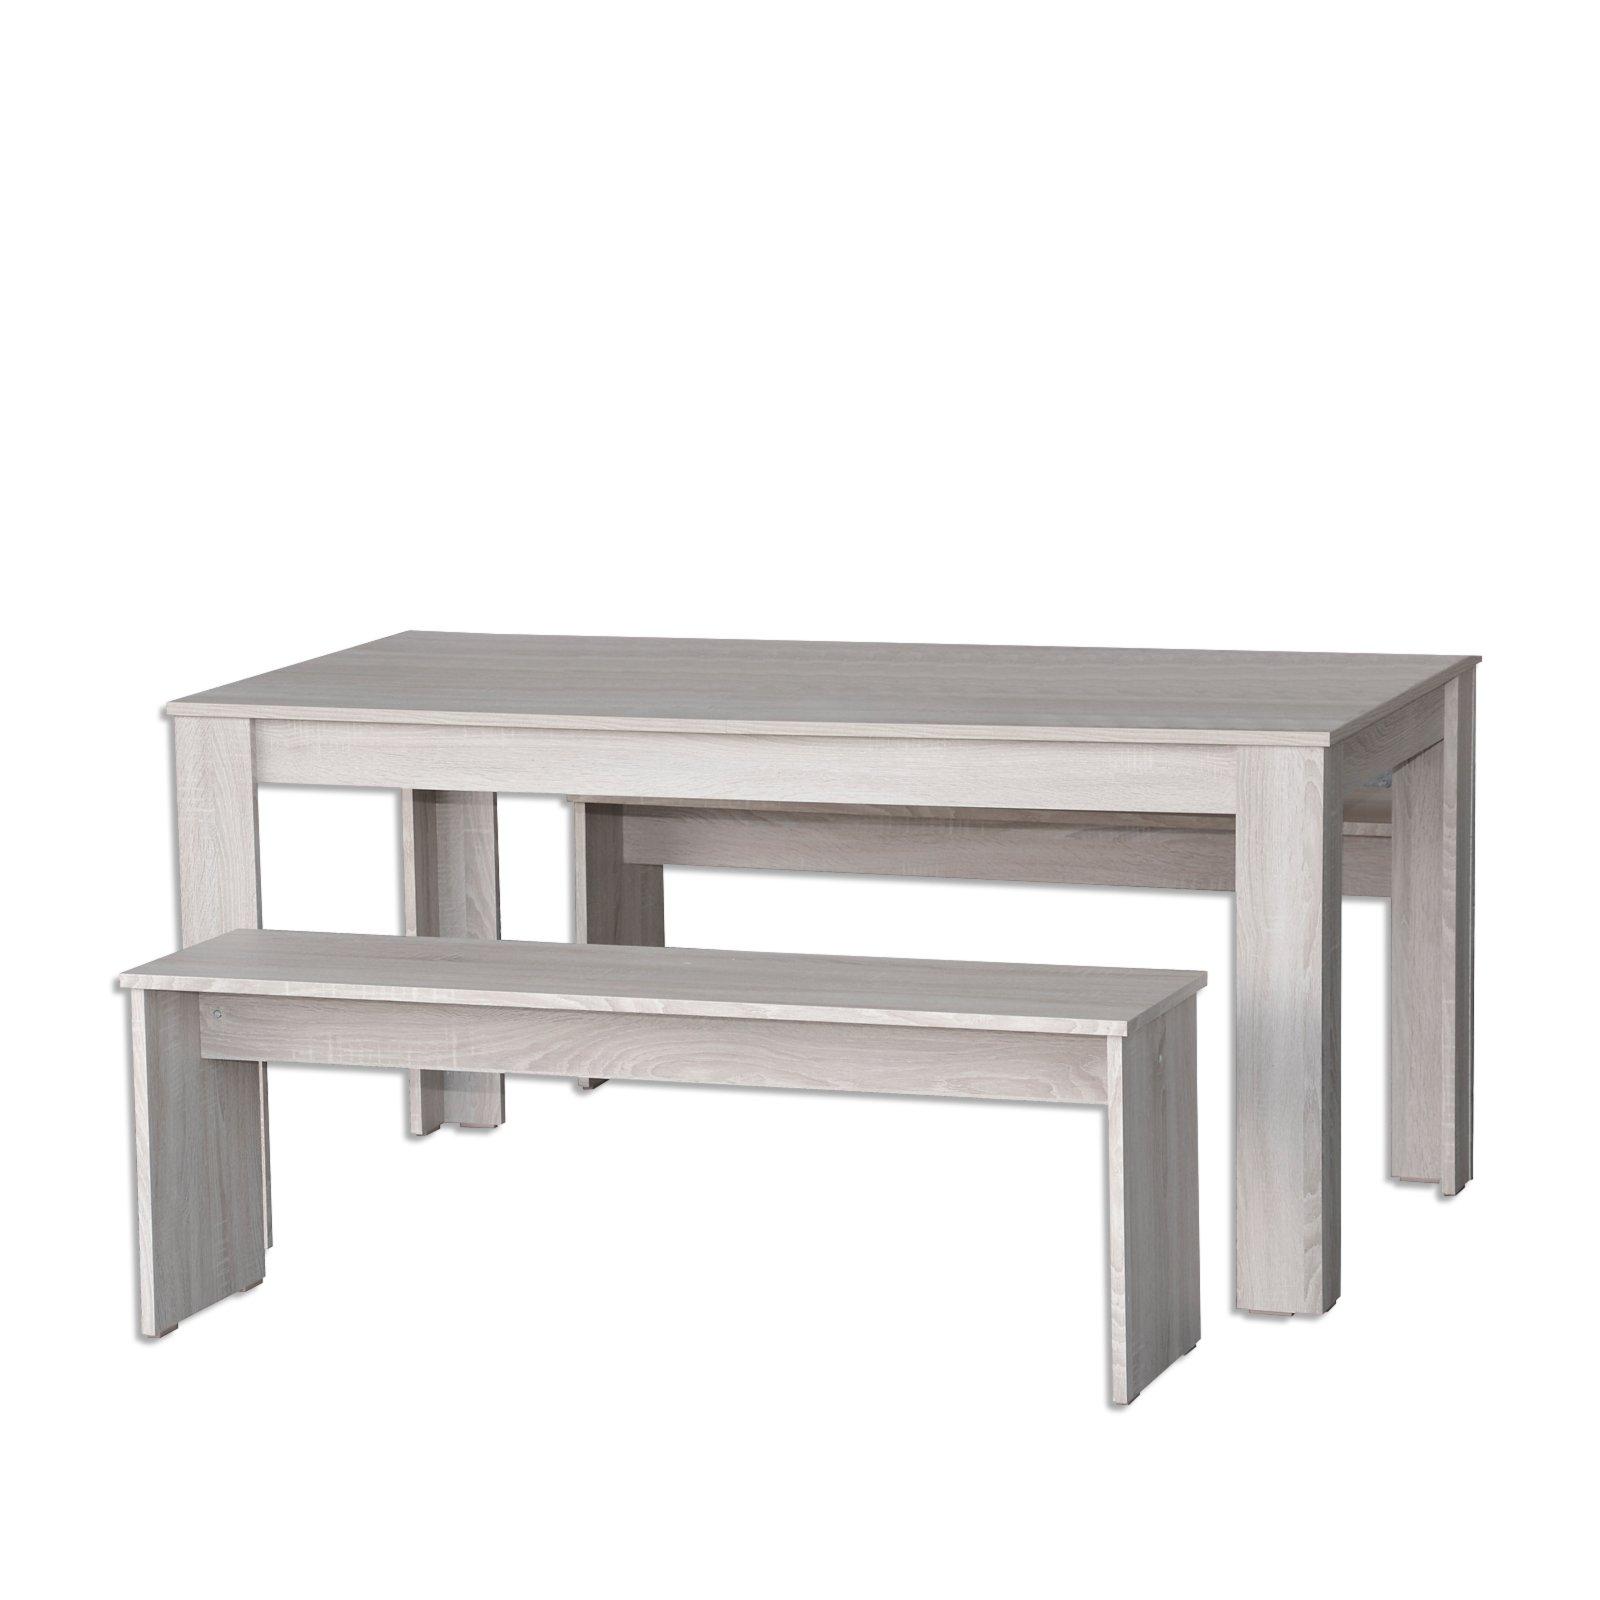 tischgruppe jazz sandeiche 3 teilig sitzb nke. Black Bedroom Furniture Sets. Home Design Ideas